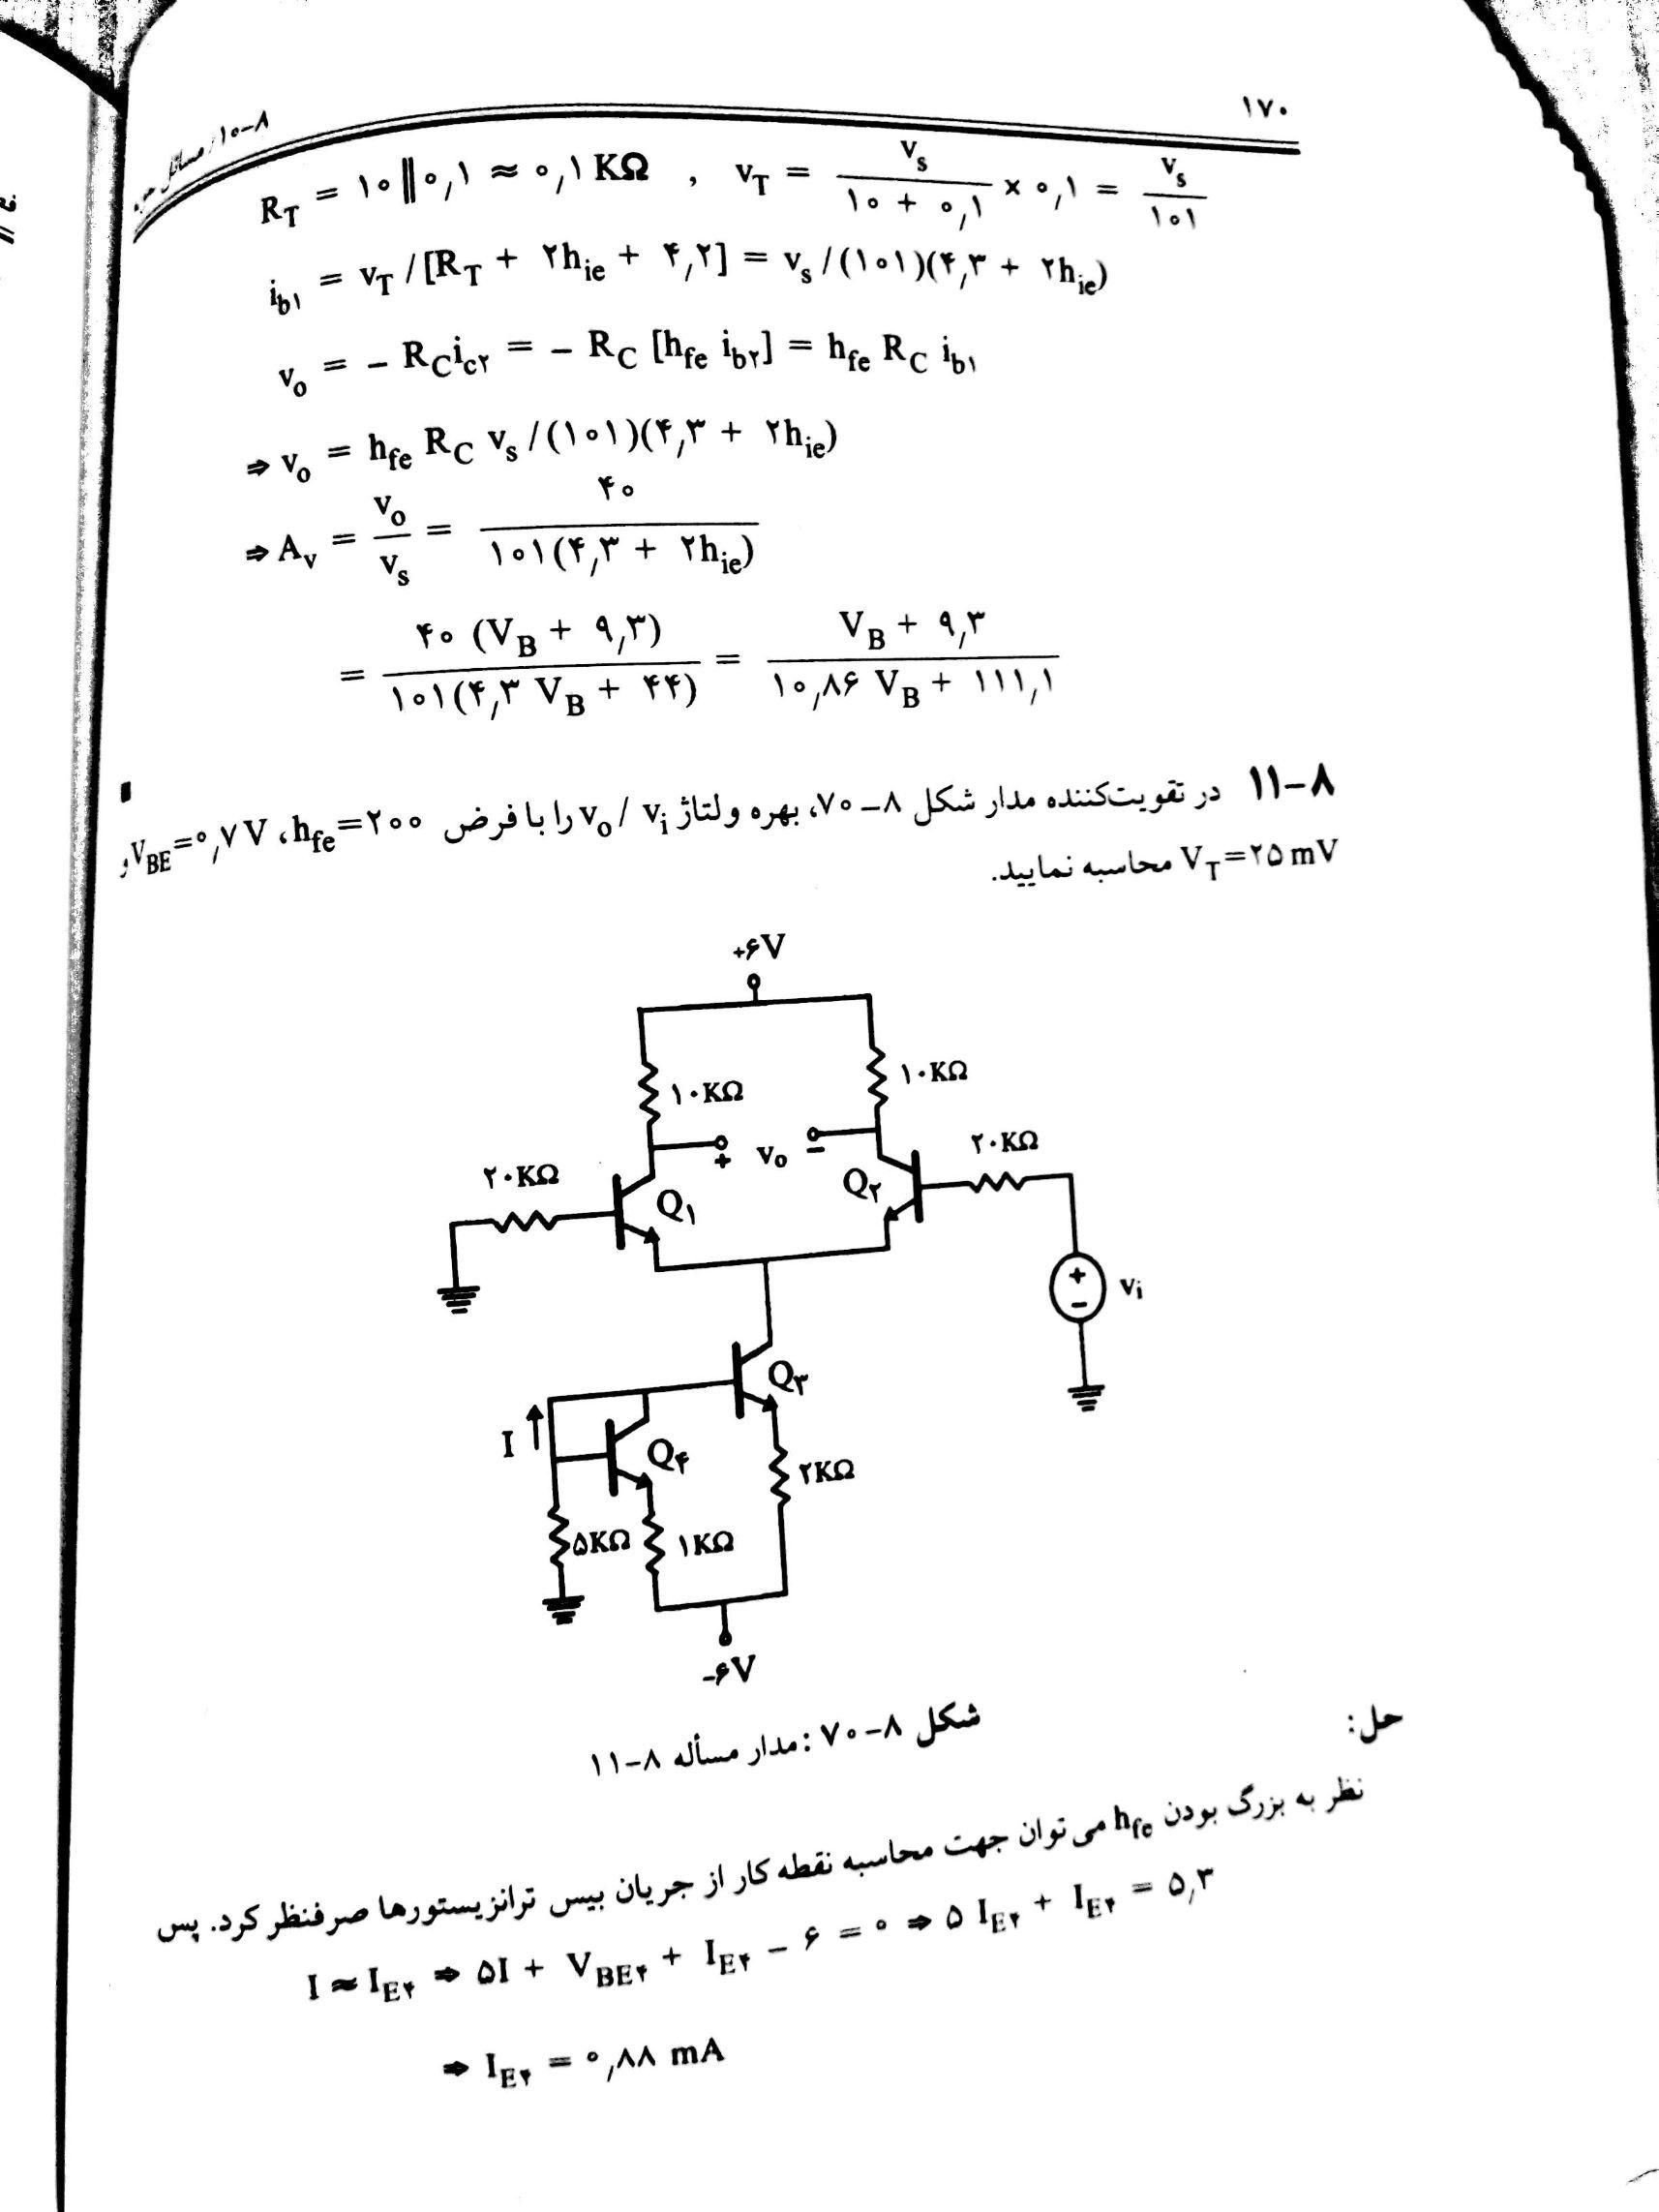 حل المسائل مبحث تفاضلی و فت ها کتاب الکترونیک 2 تقی شفیعی